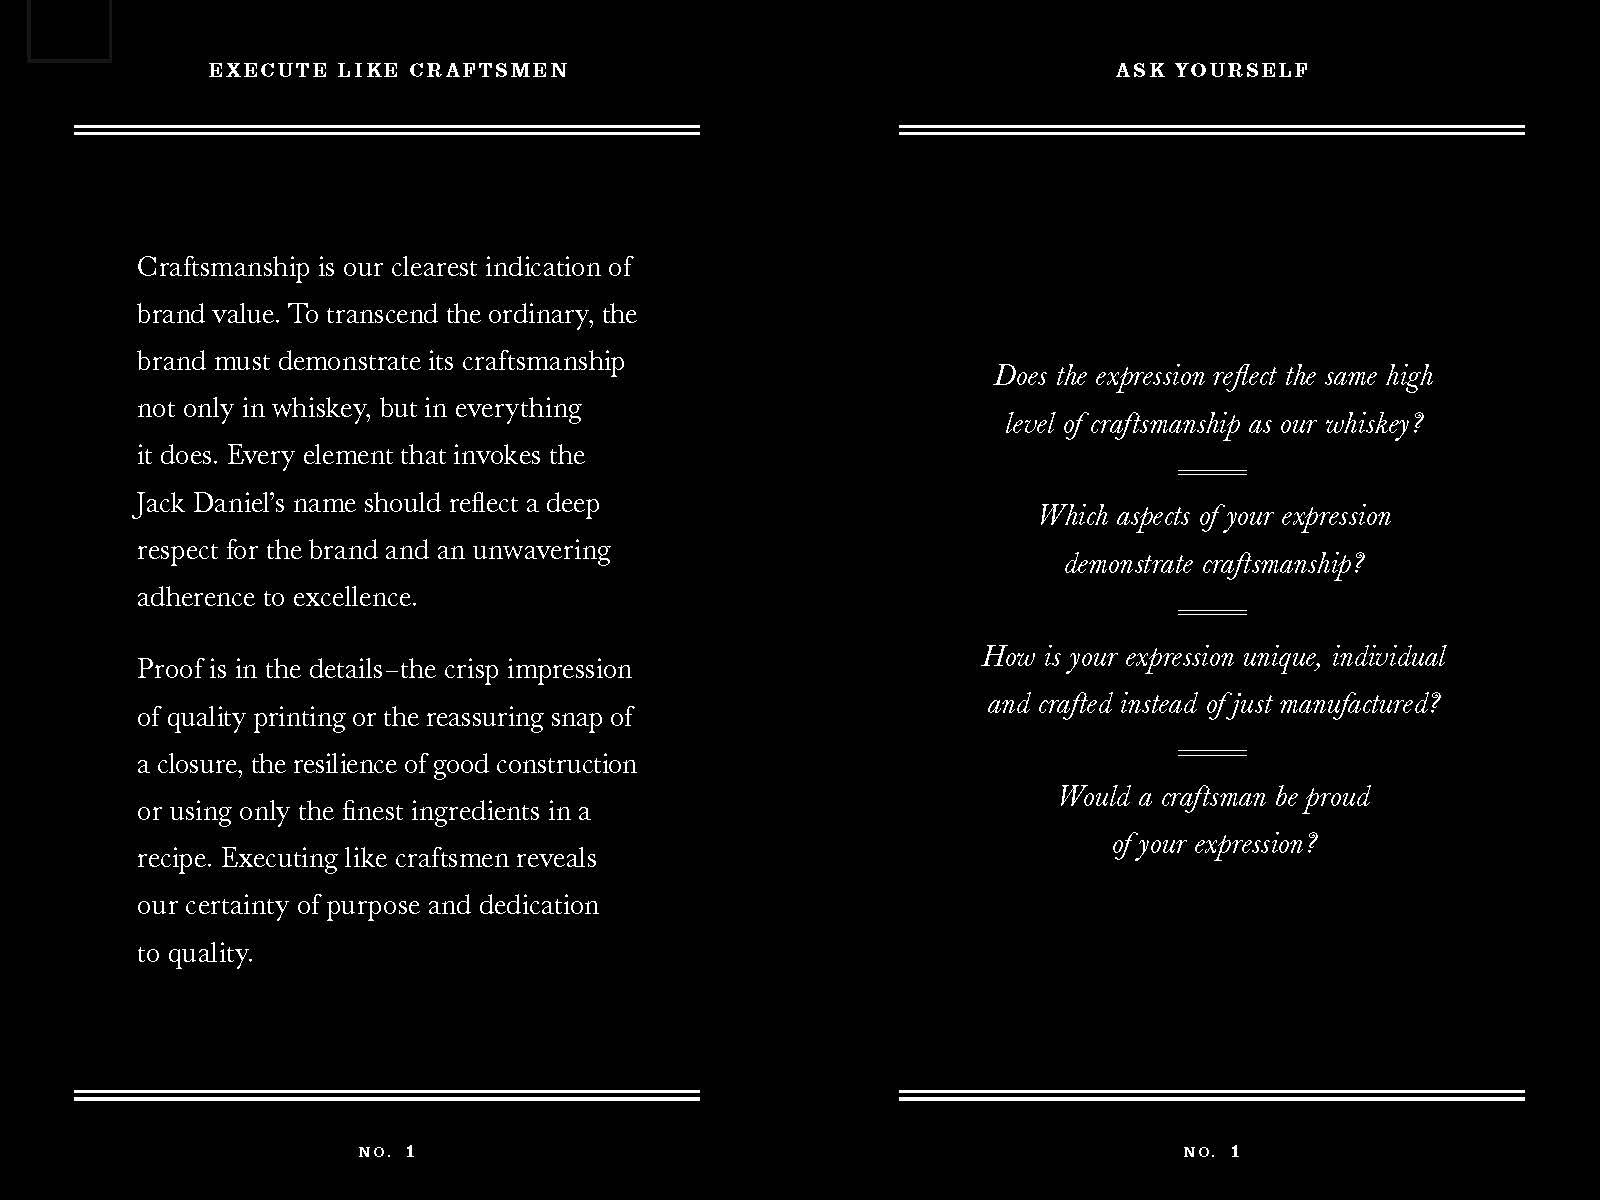 Jack Daniel's Guiding Principles 2012_Page_05.jpg